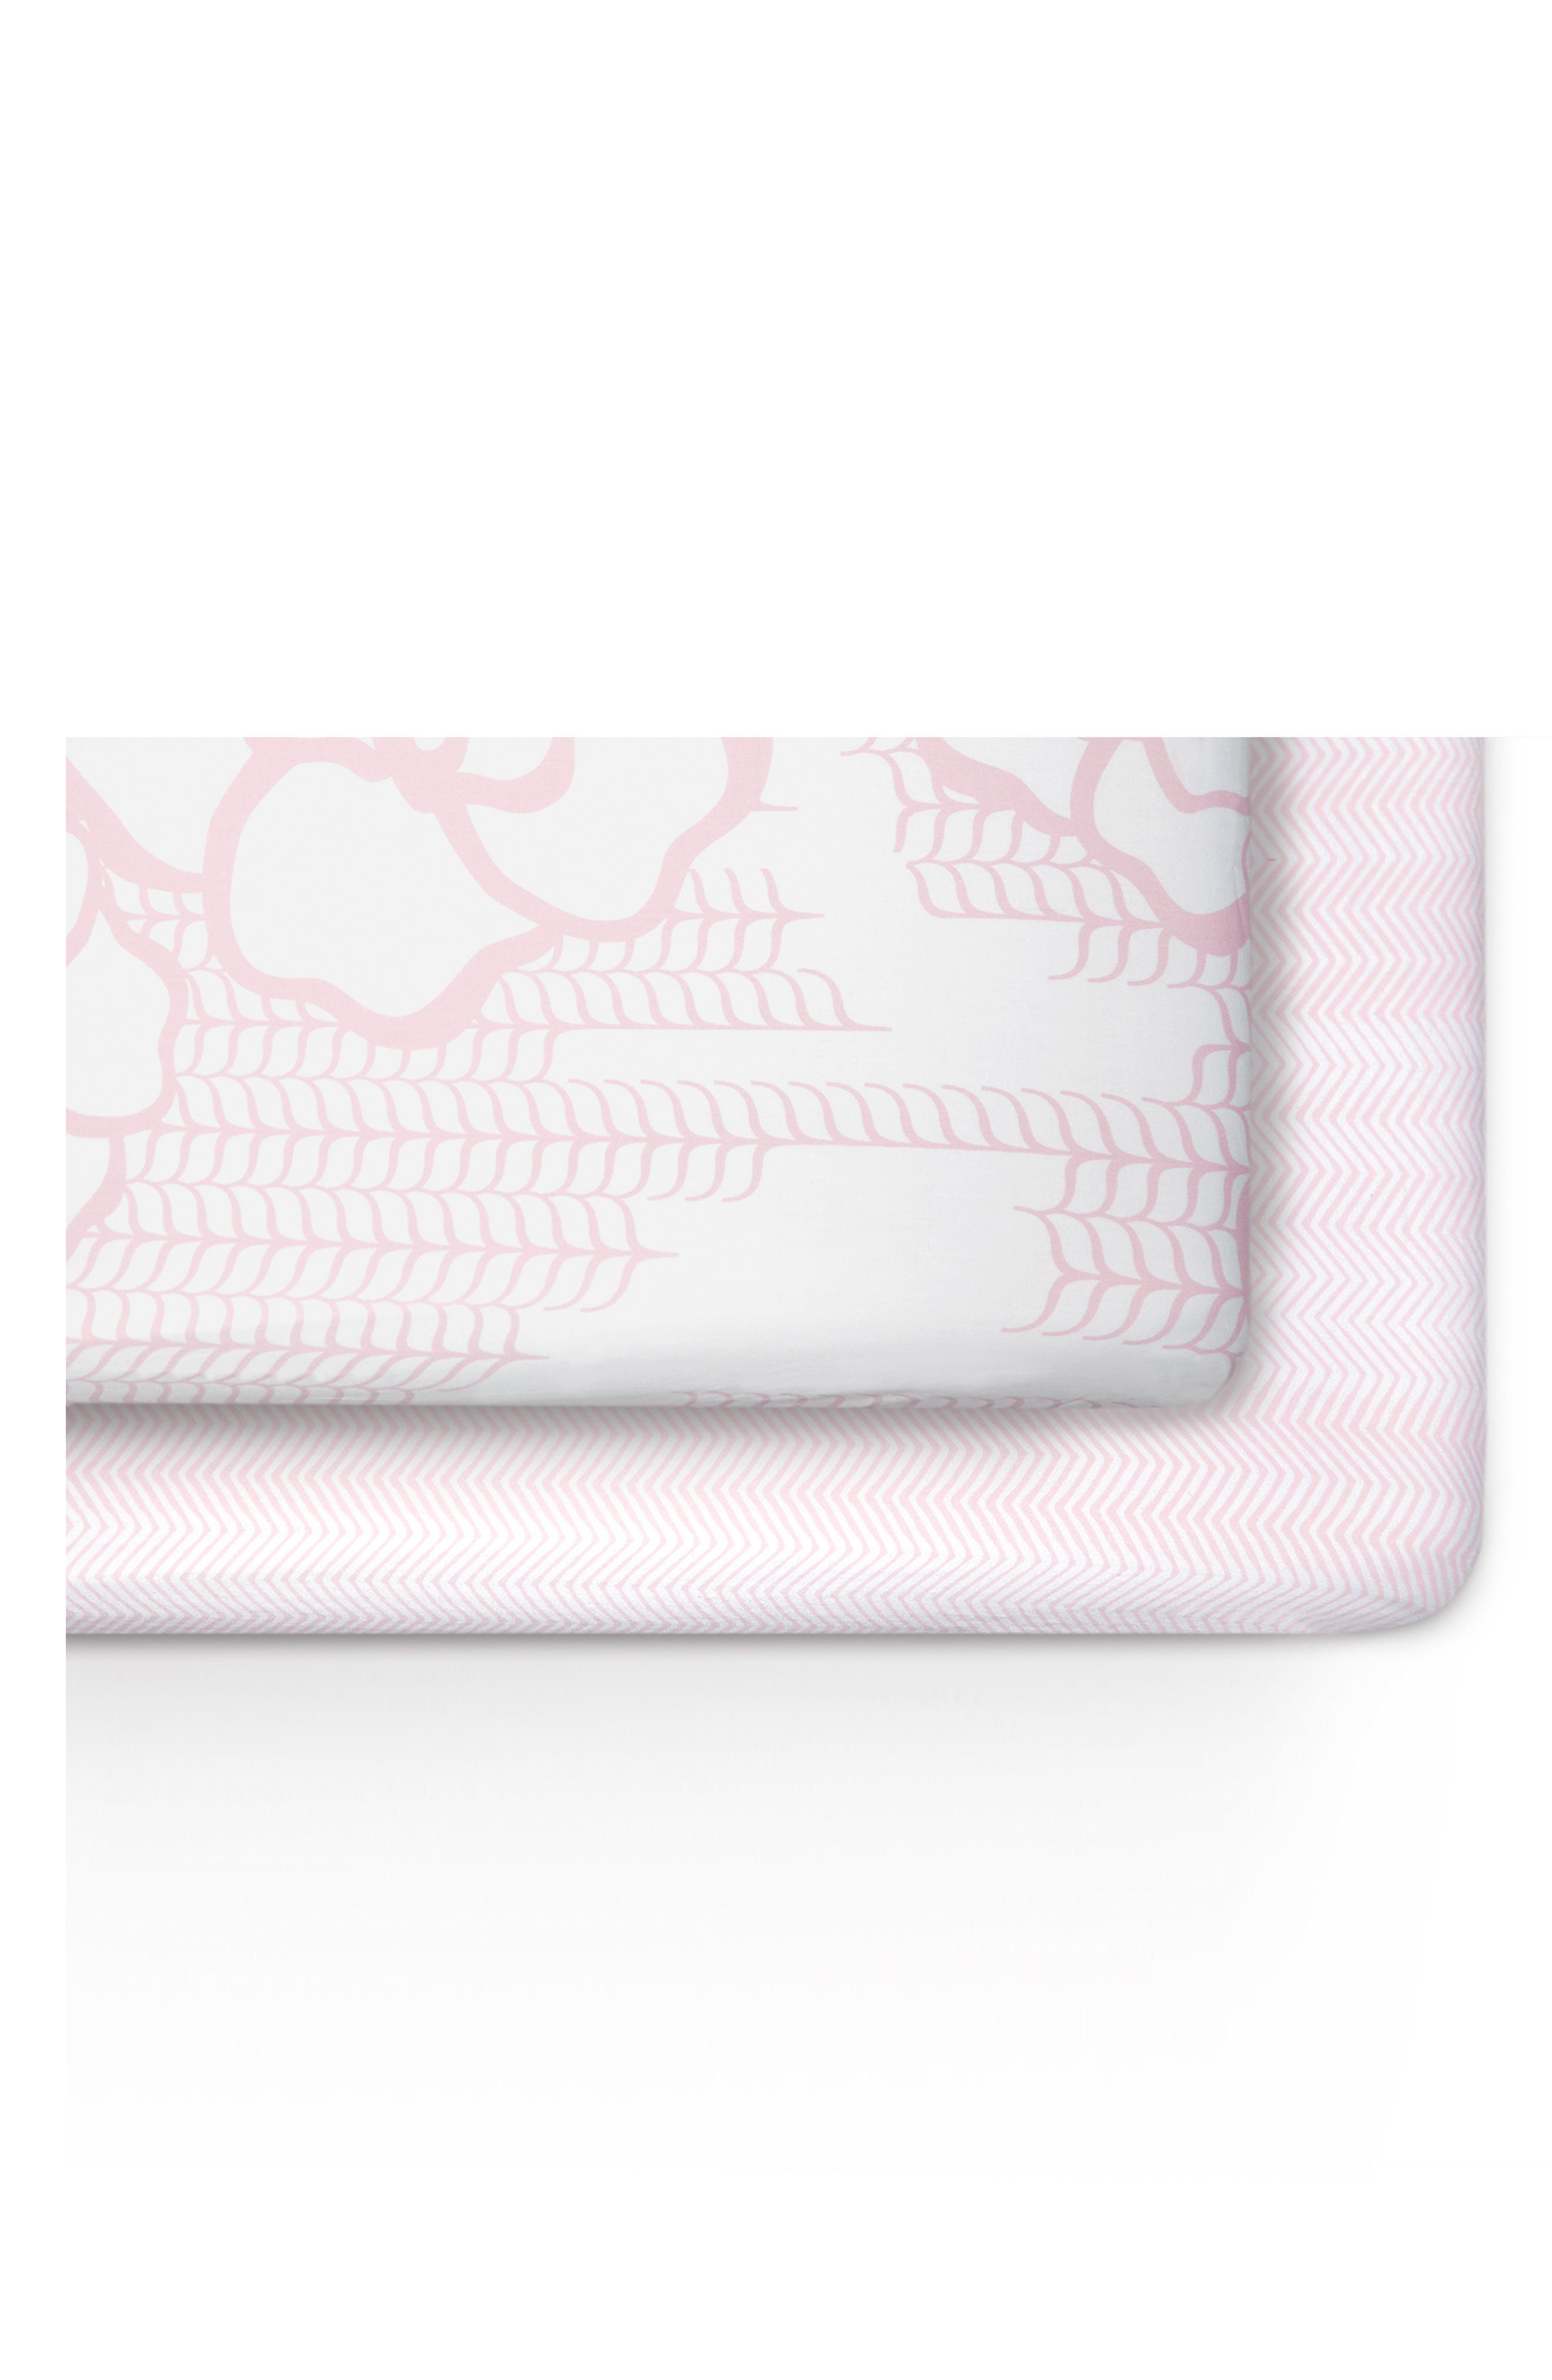 Capri & Zigzag 2-Pack Jersey Crib Sheets,                             Main thumbnail 1, color,                             Capri